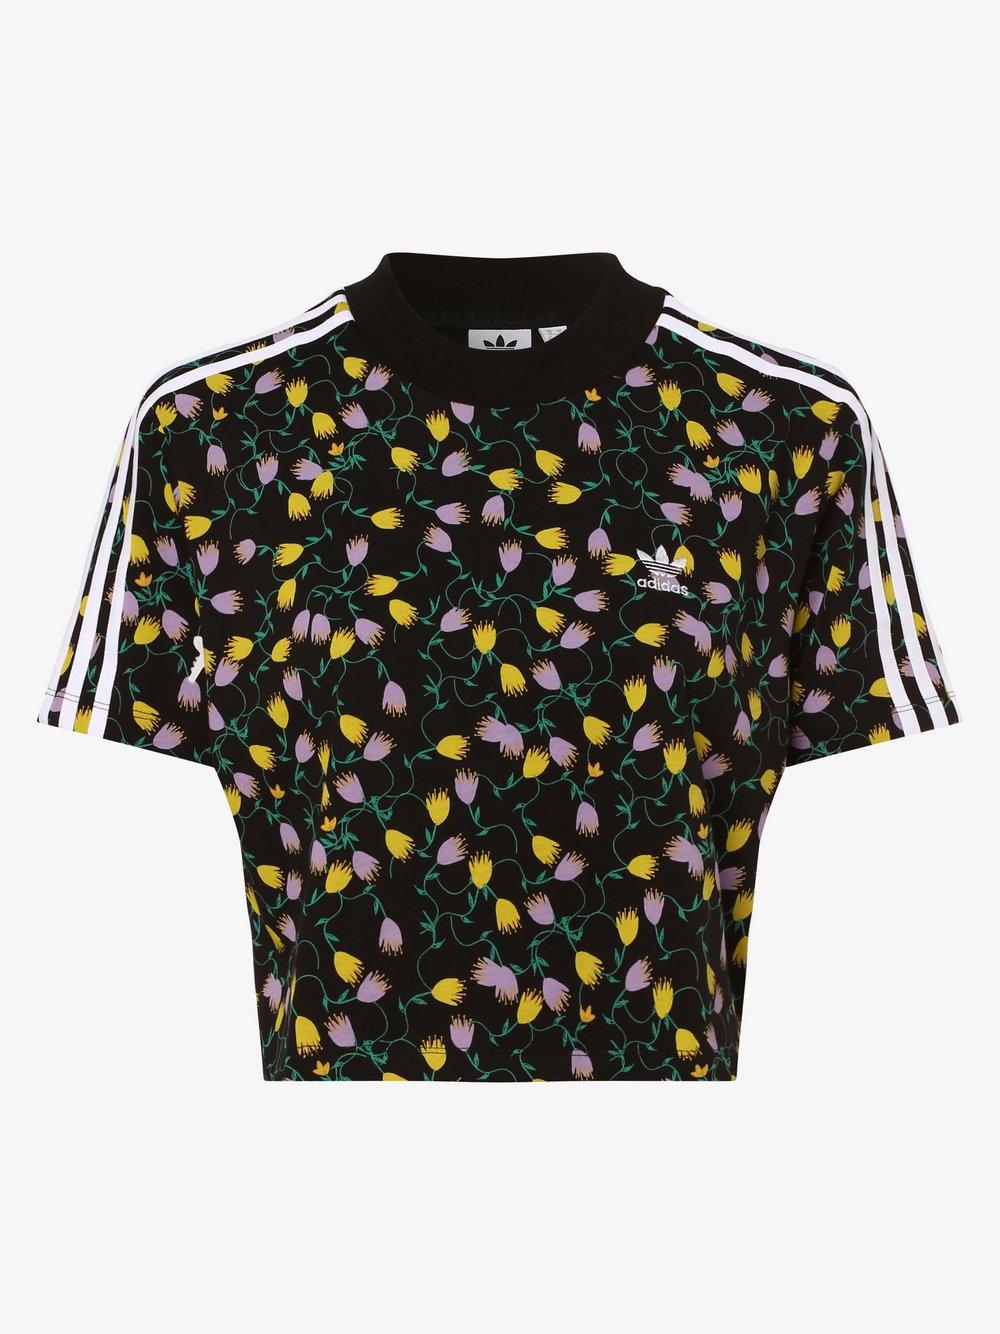 adidas Originals - T-shirt damski, wielokolorowy